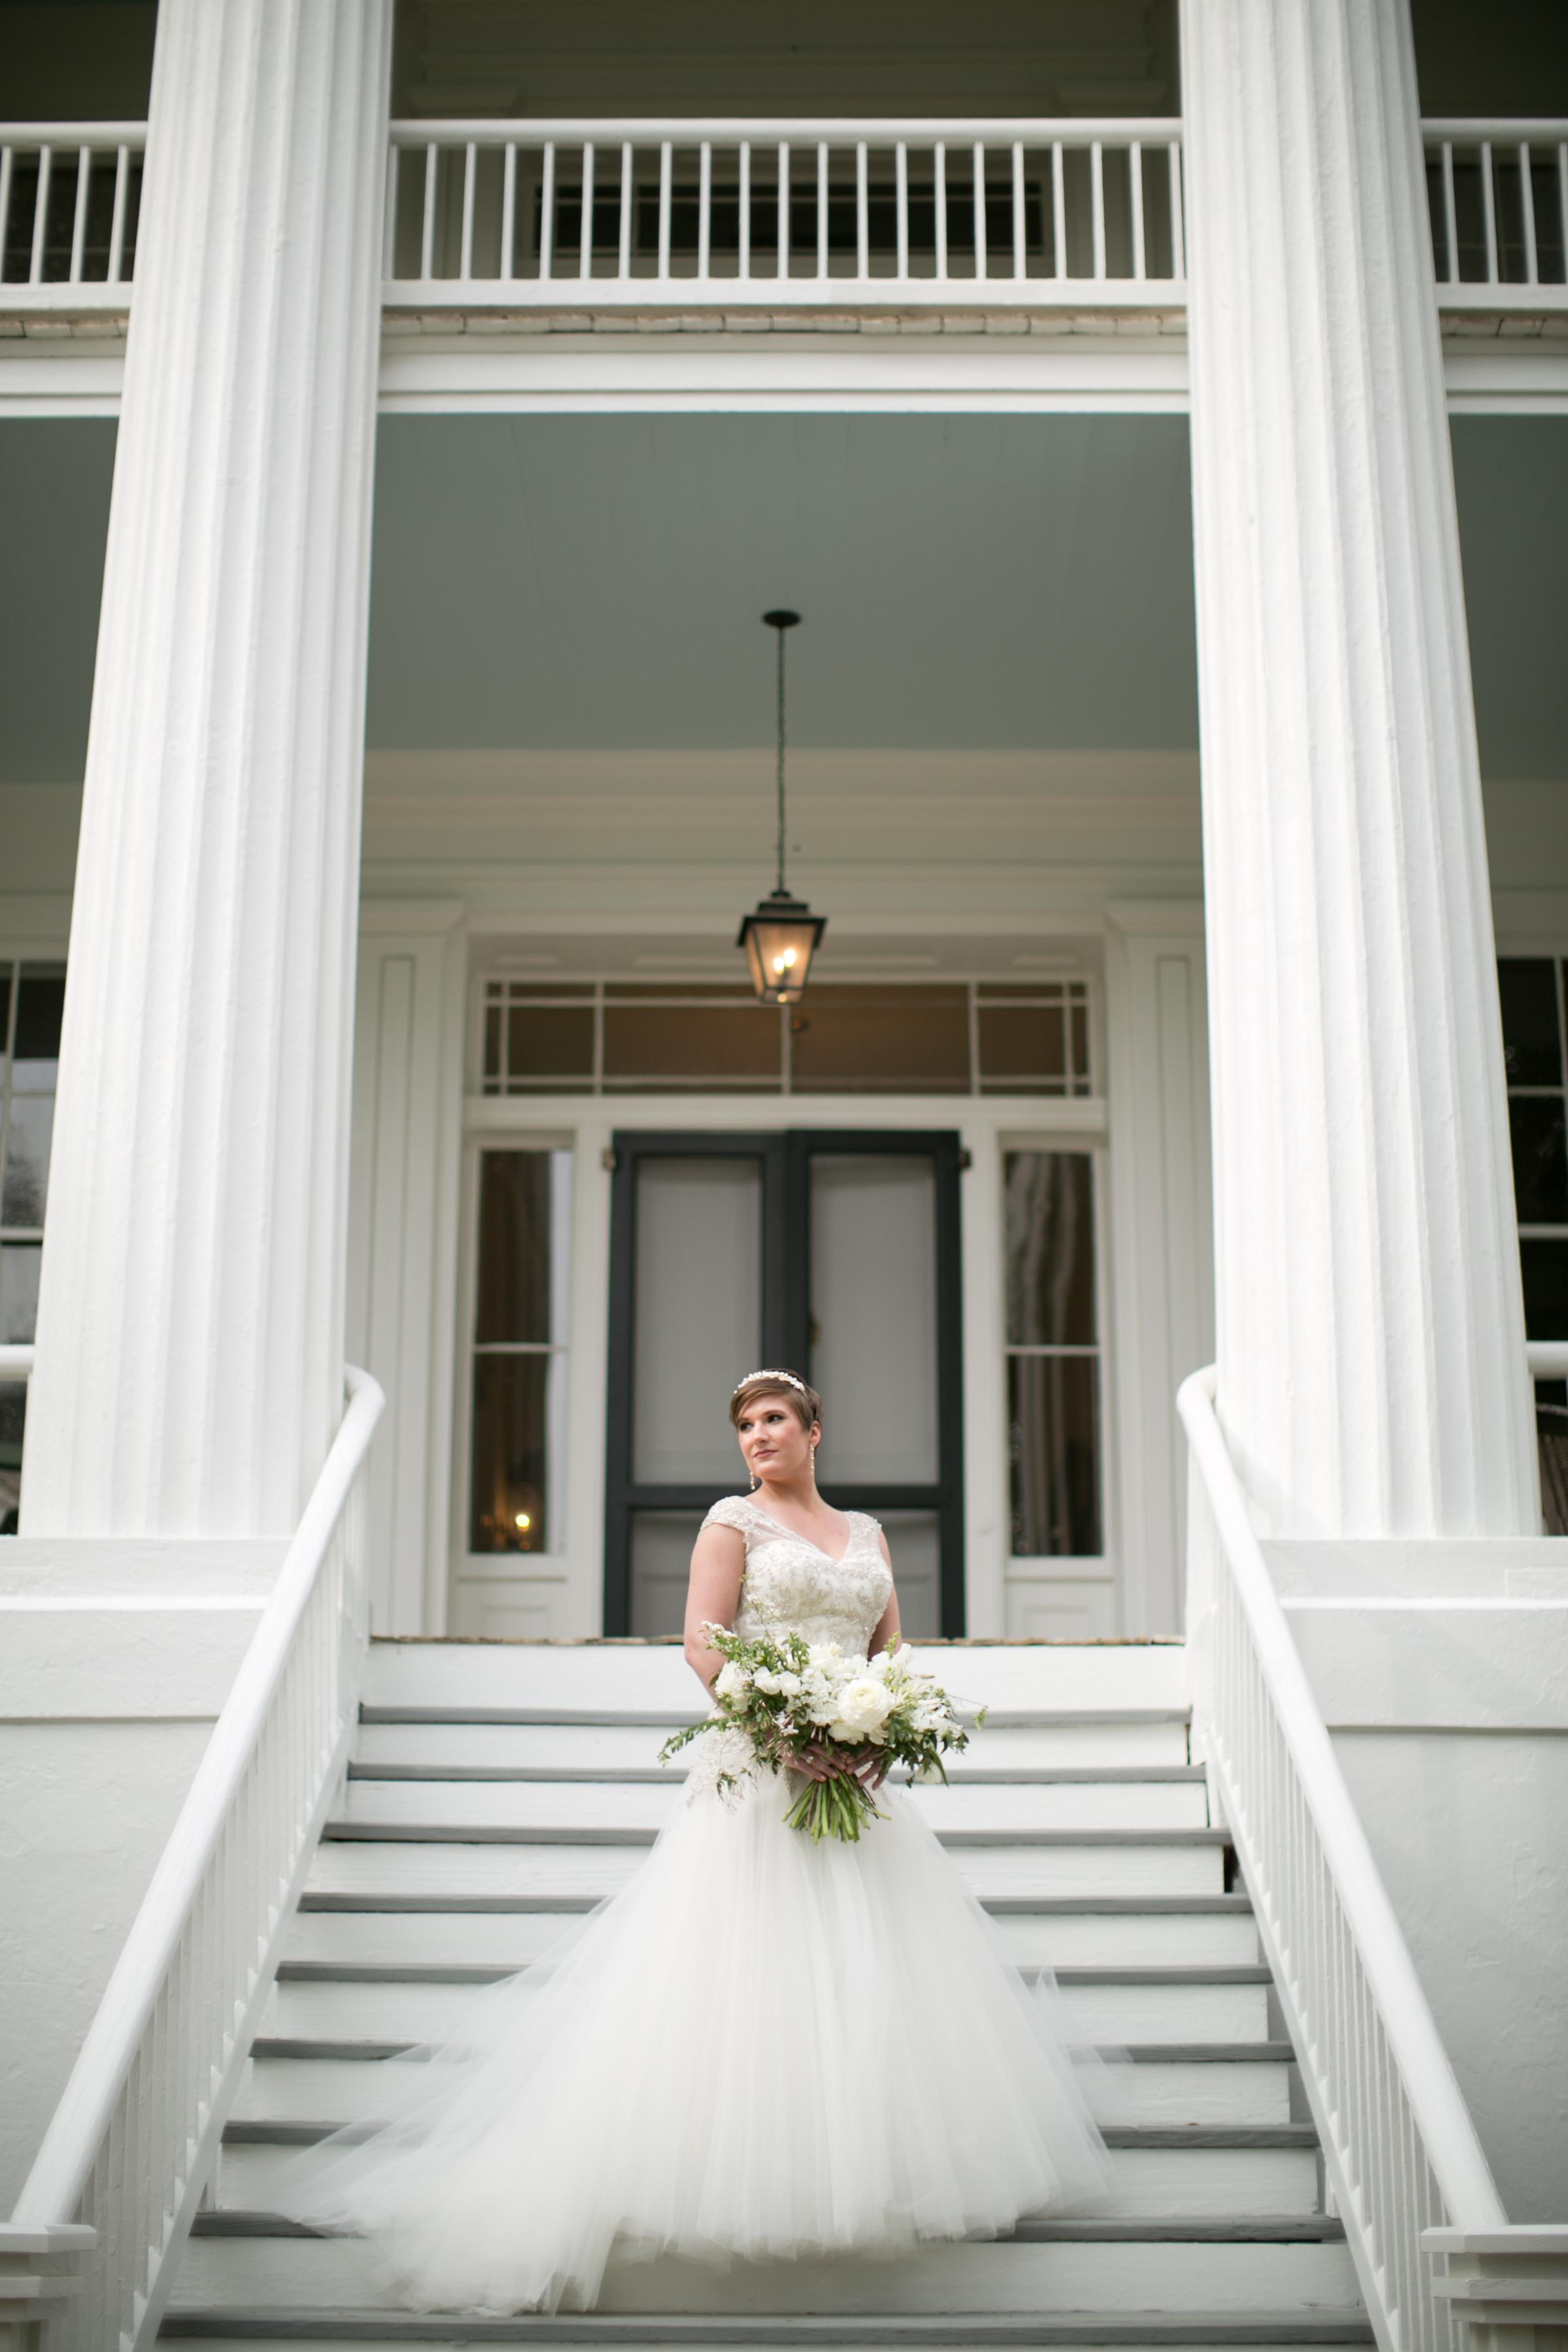 wavering_place_wedding20.jpg